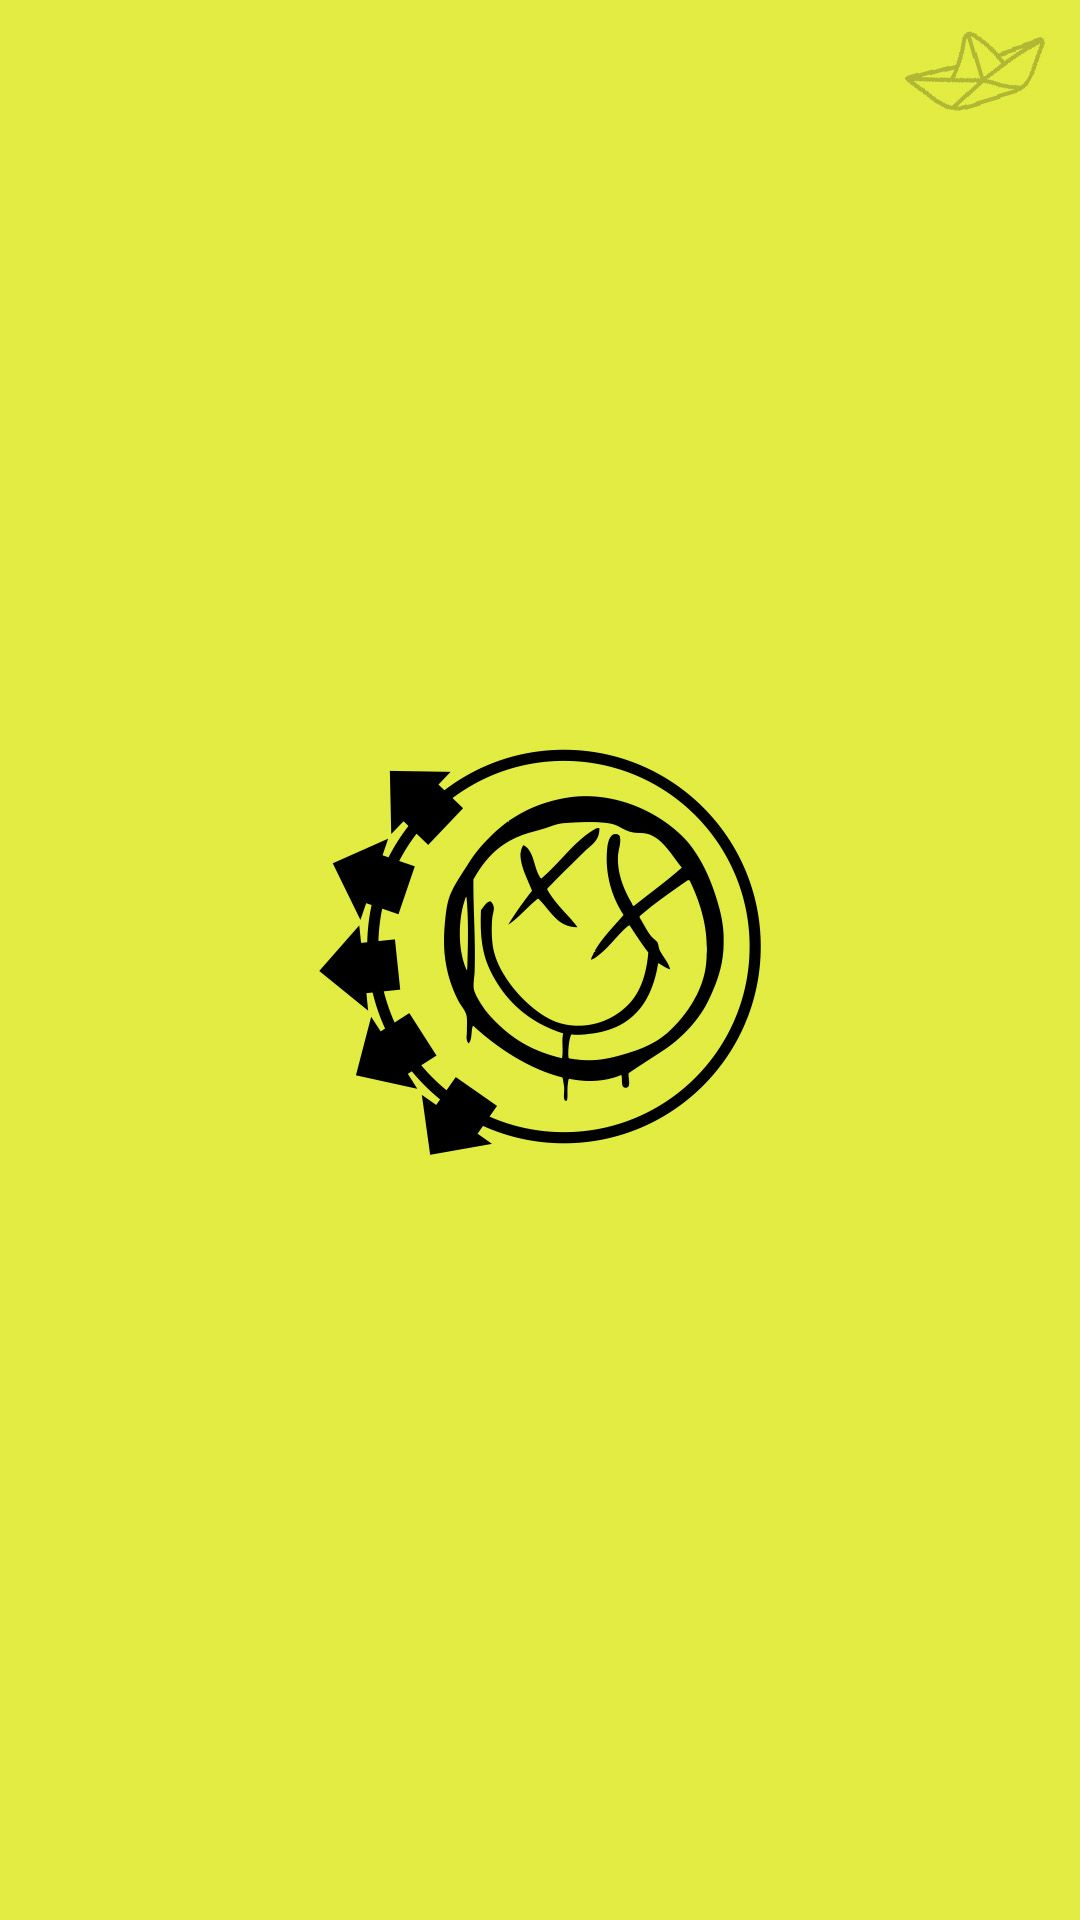 Yellowbackground Blink182 Fpndos De Pantalla Fondos De Pantalla Del Telefono Fondos De Pantalla De Iphone